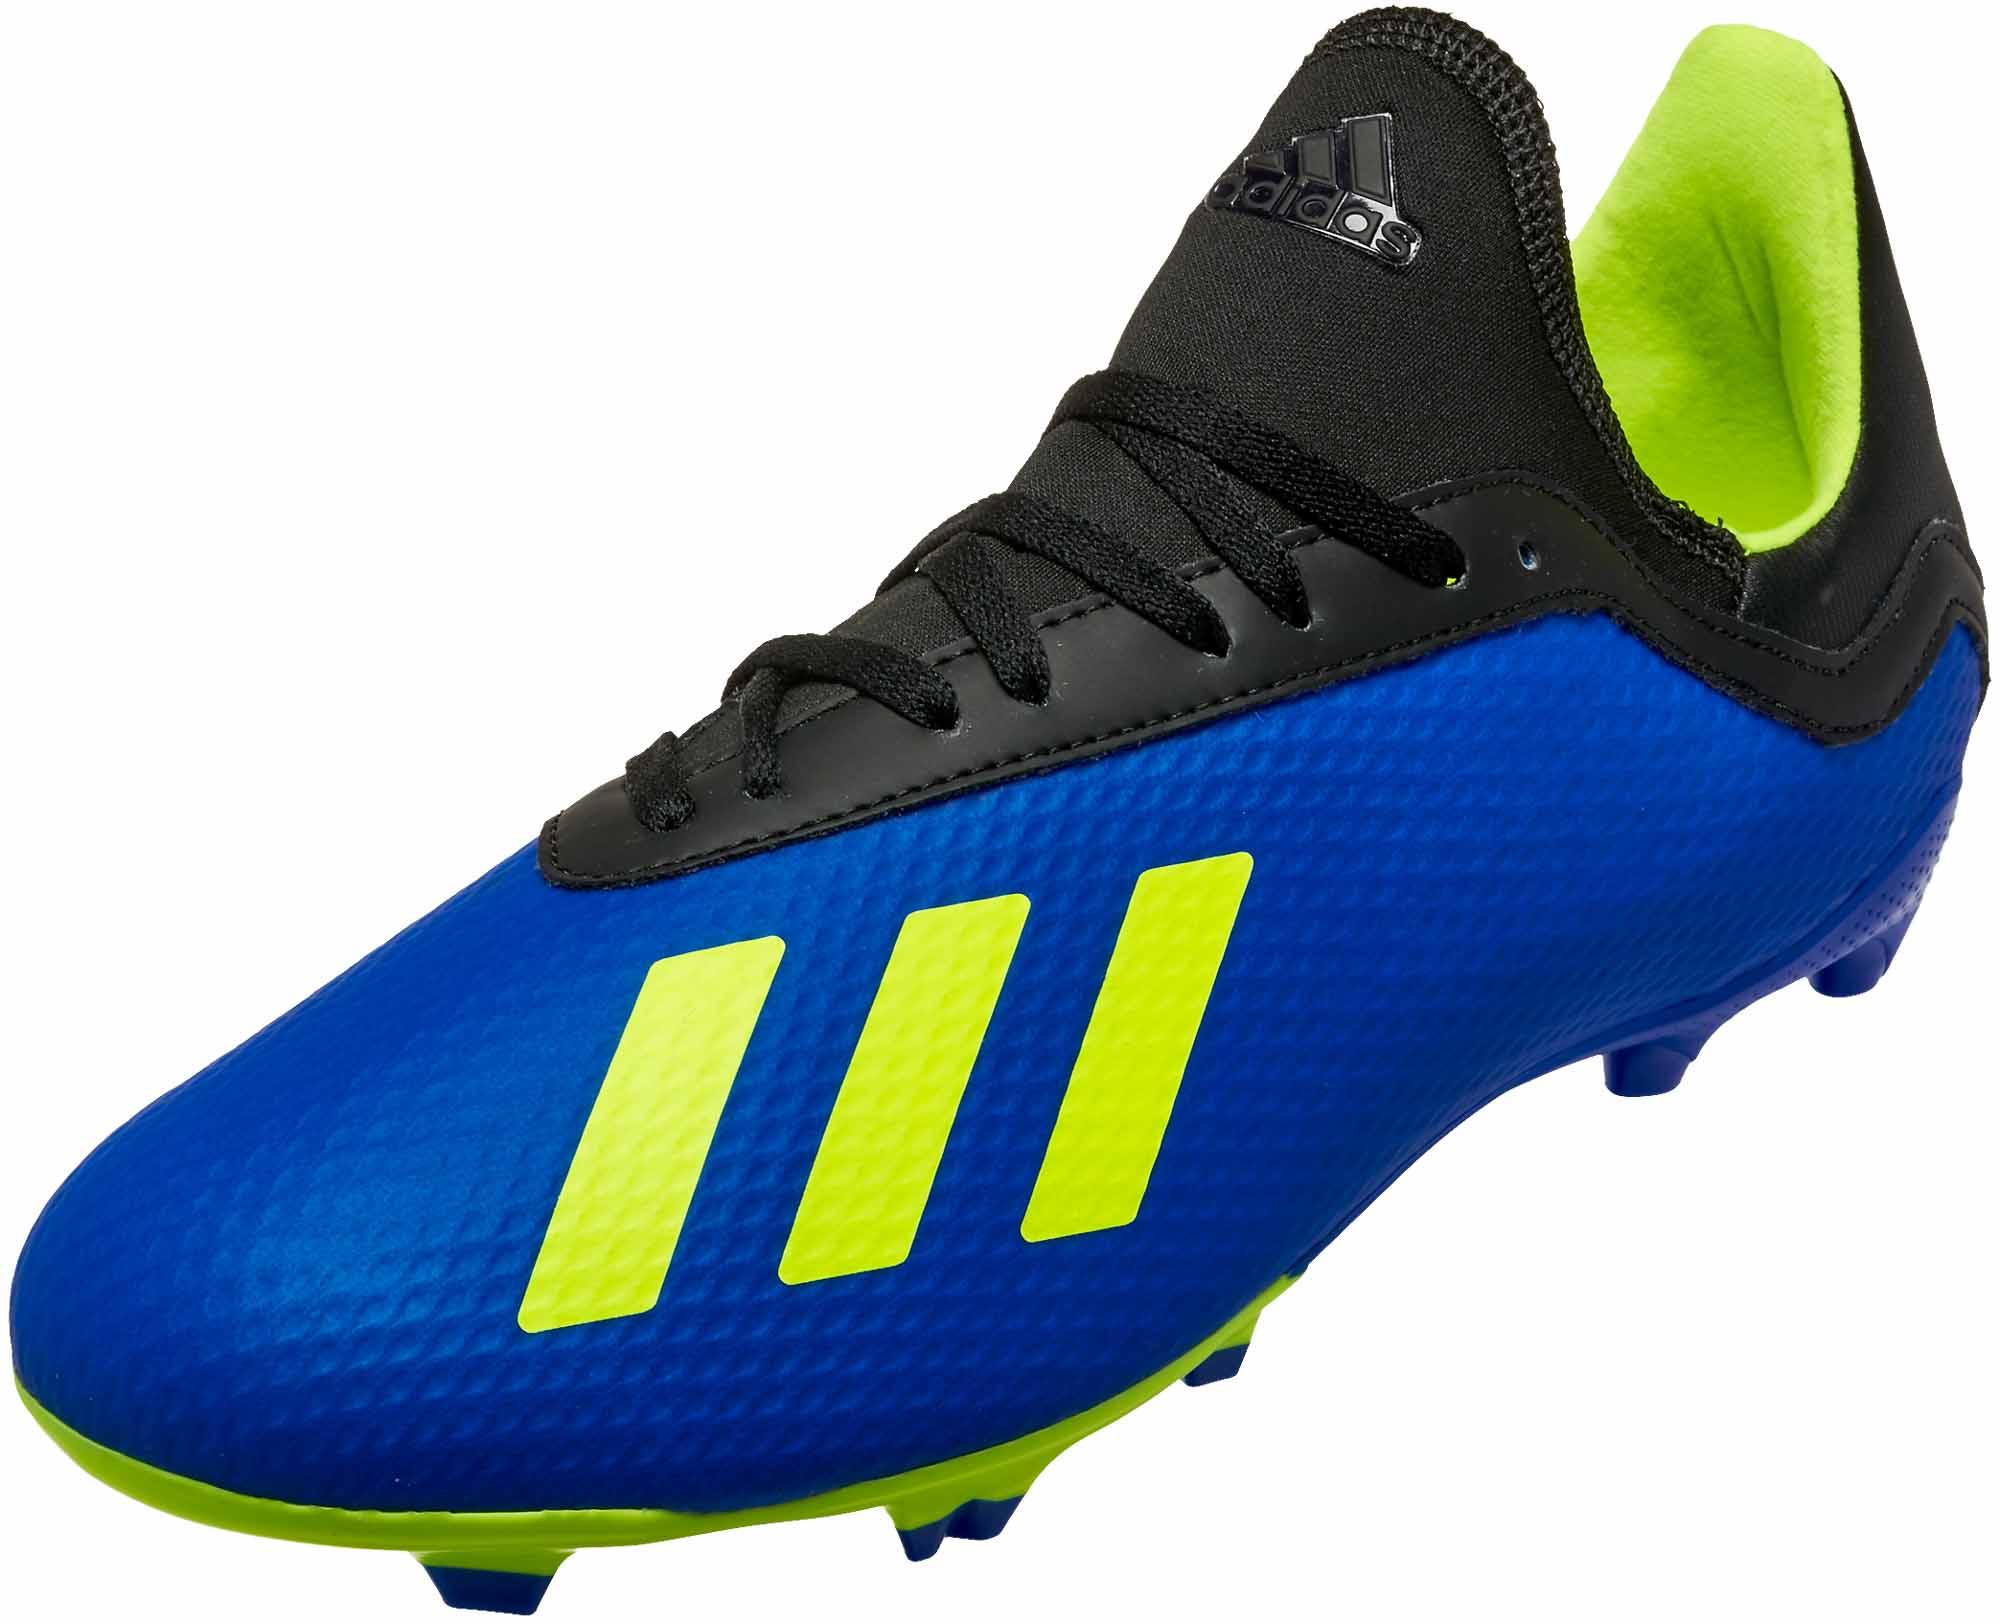 4a7c0c2e3358 Kids adidas X 18.3 FG - Football Blue/Solar Yellow/Black - Soccer Master